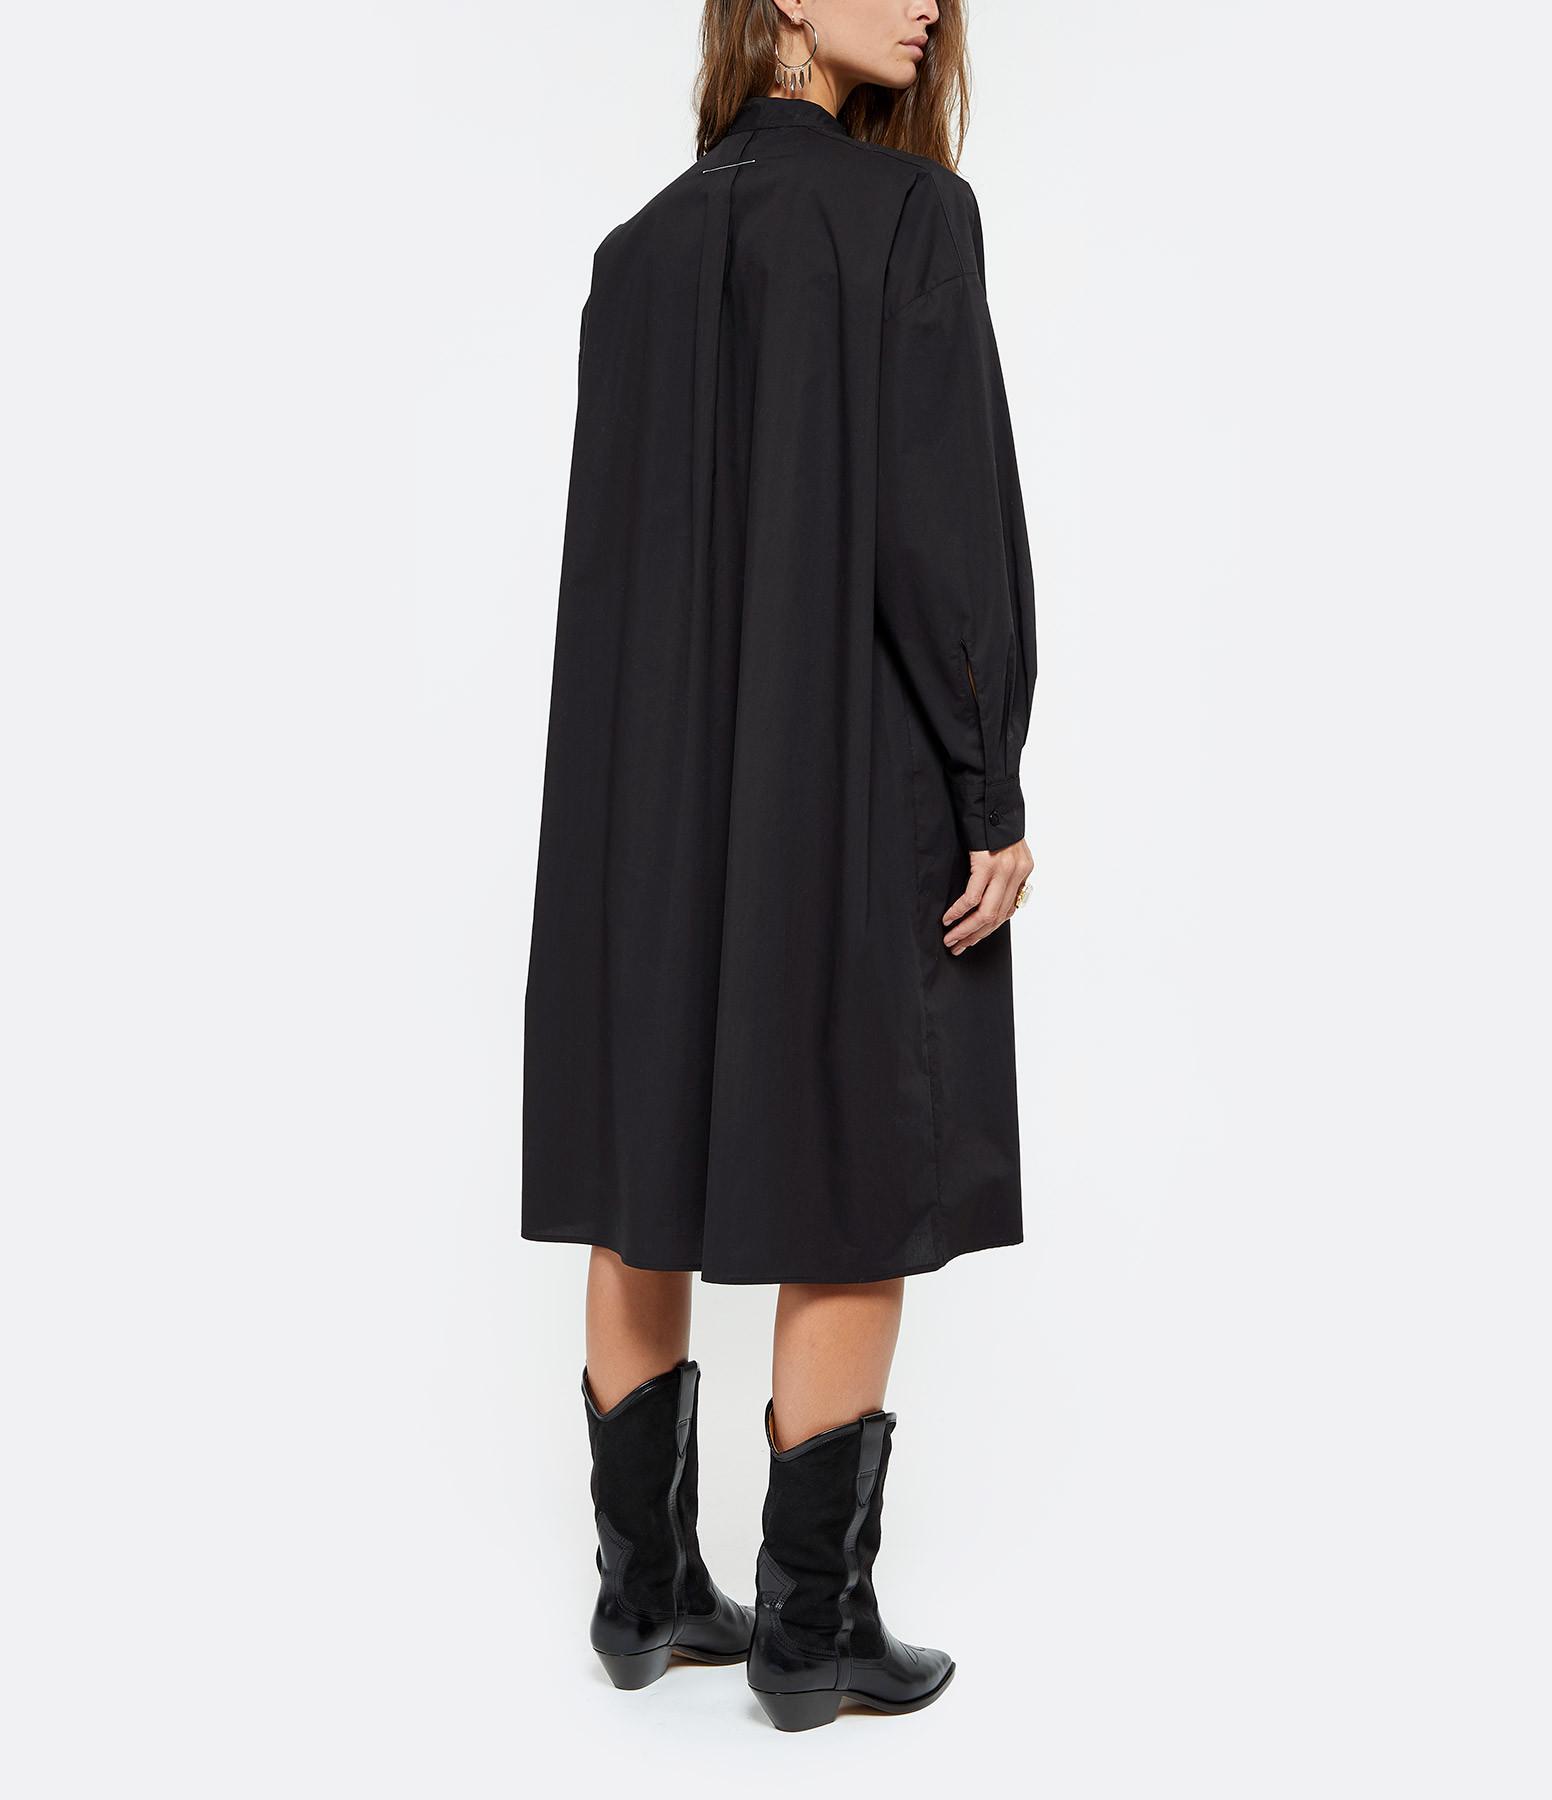 MM6 MAISON MARGIELA - Robe Popeline Parachute Noir